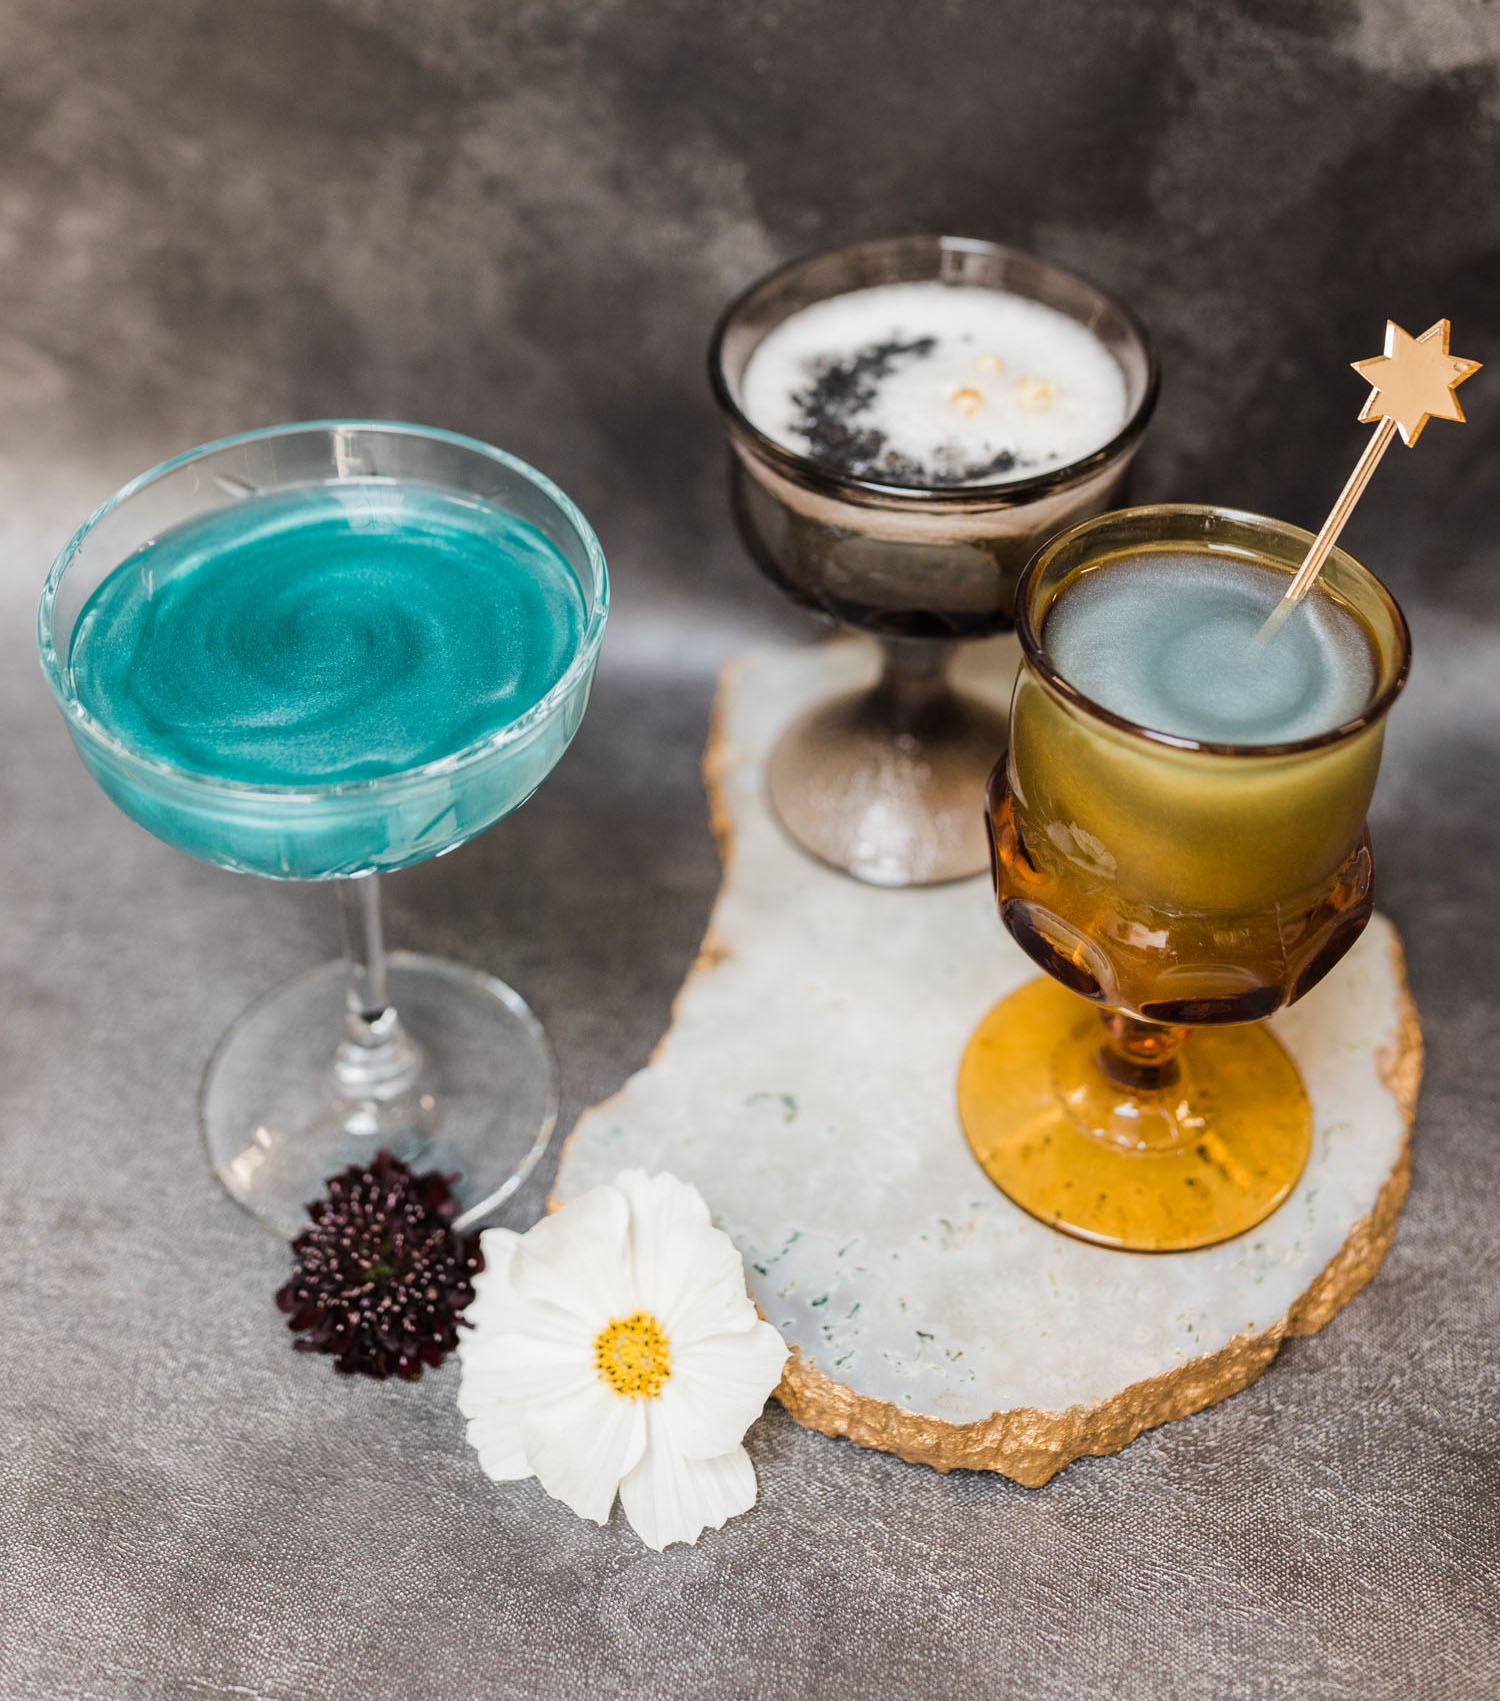 celestial cocktails